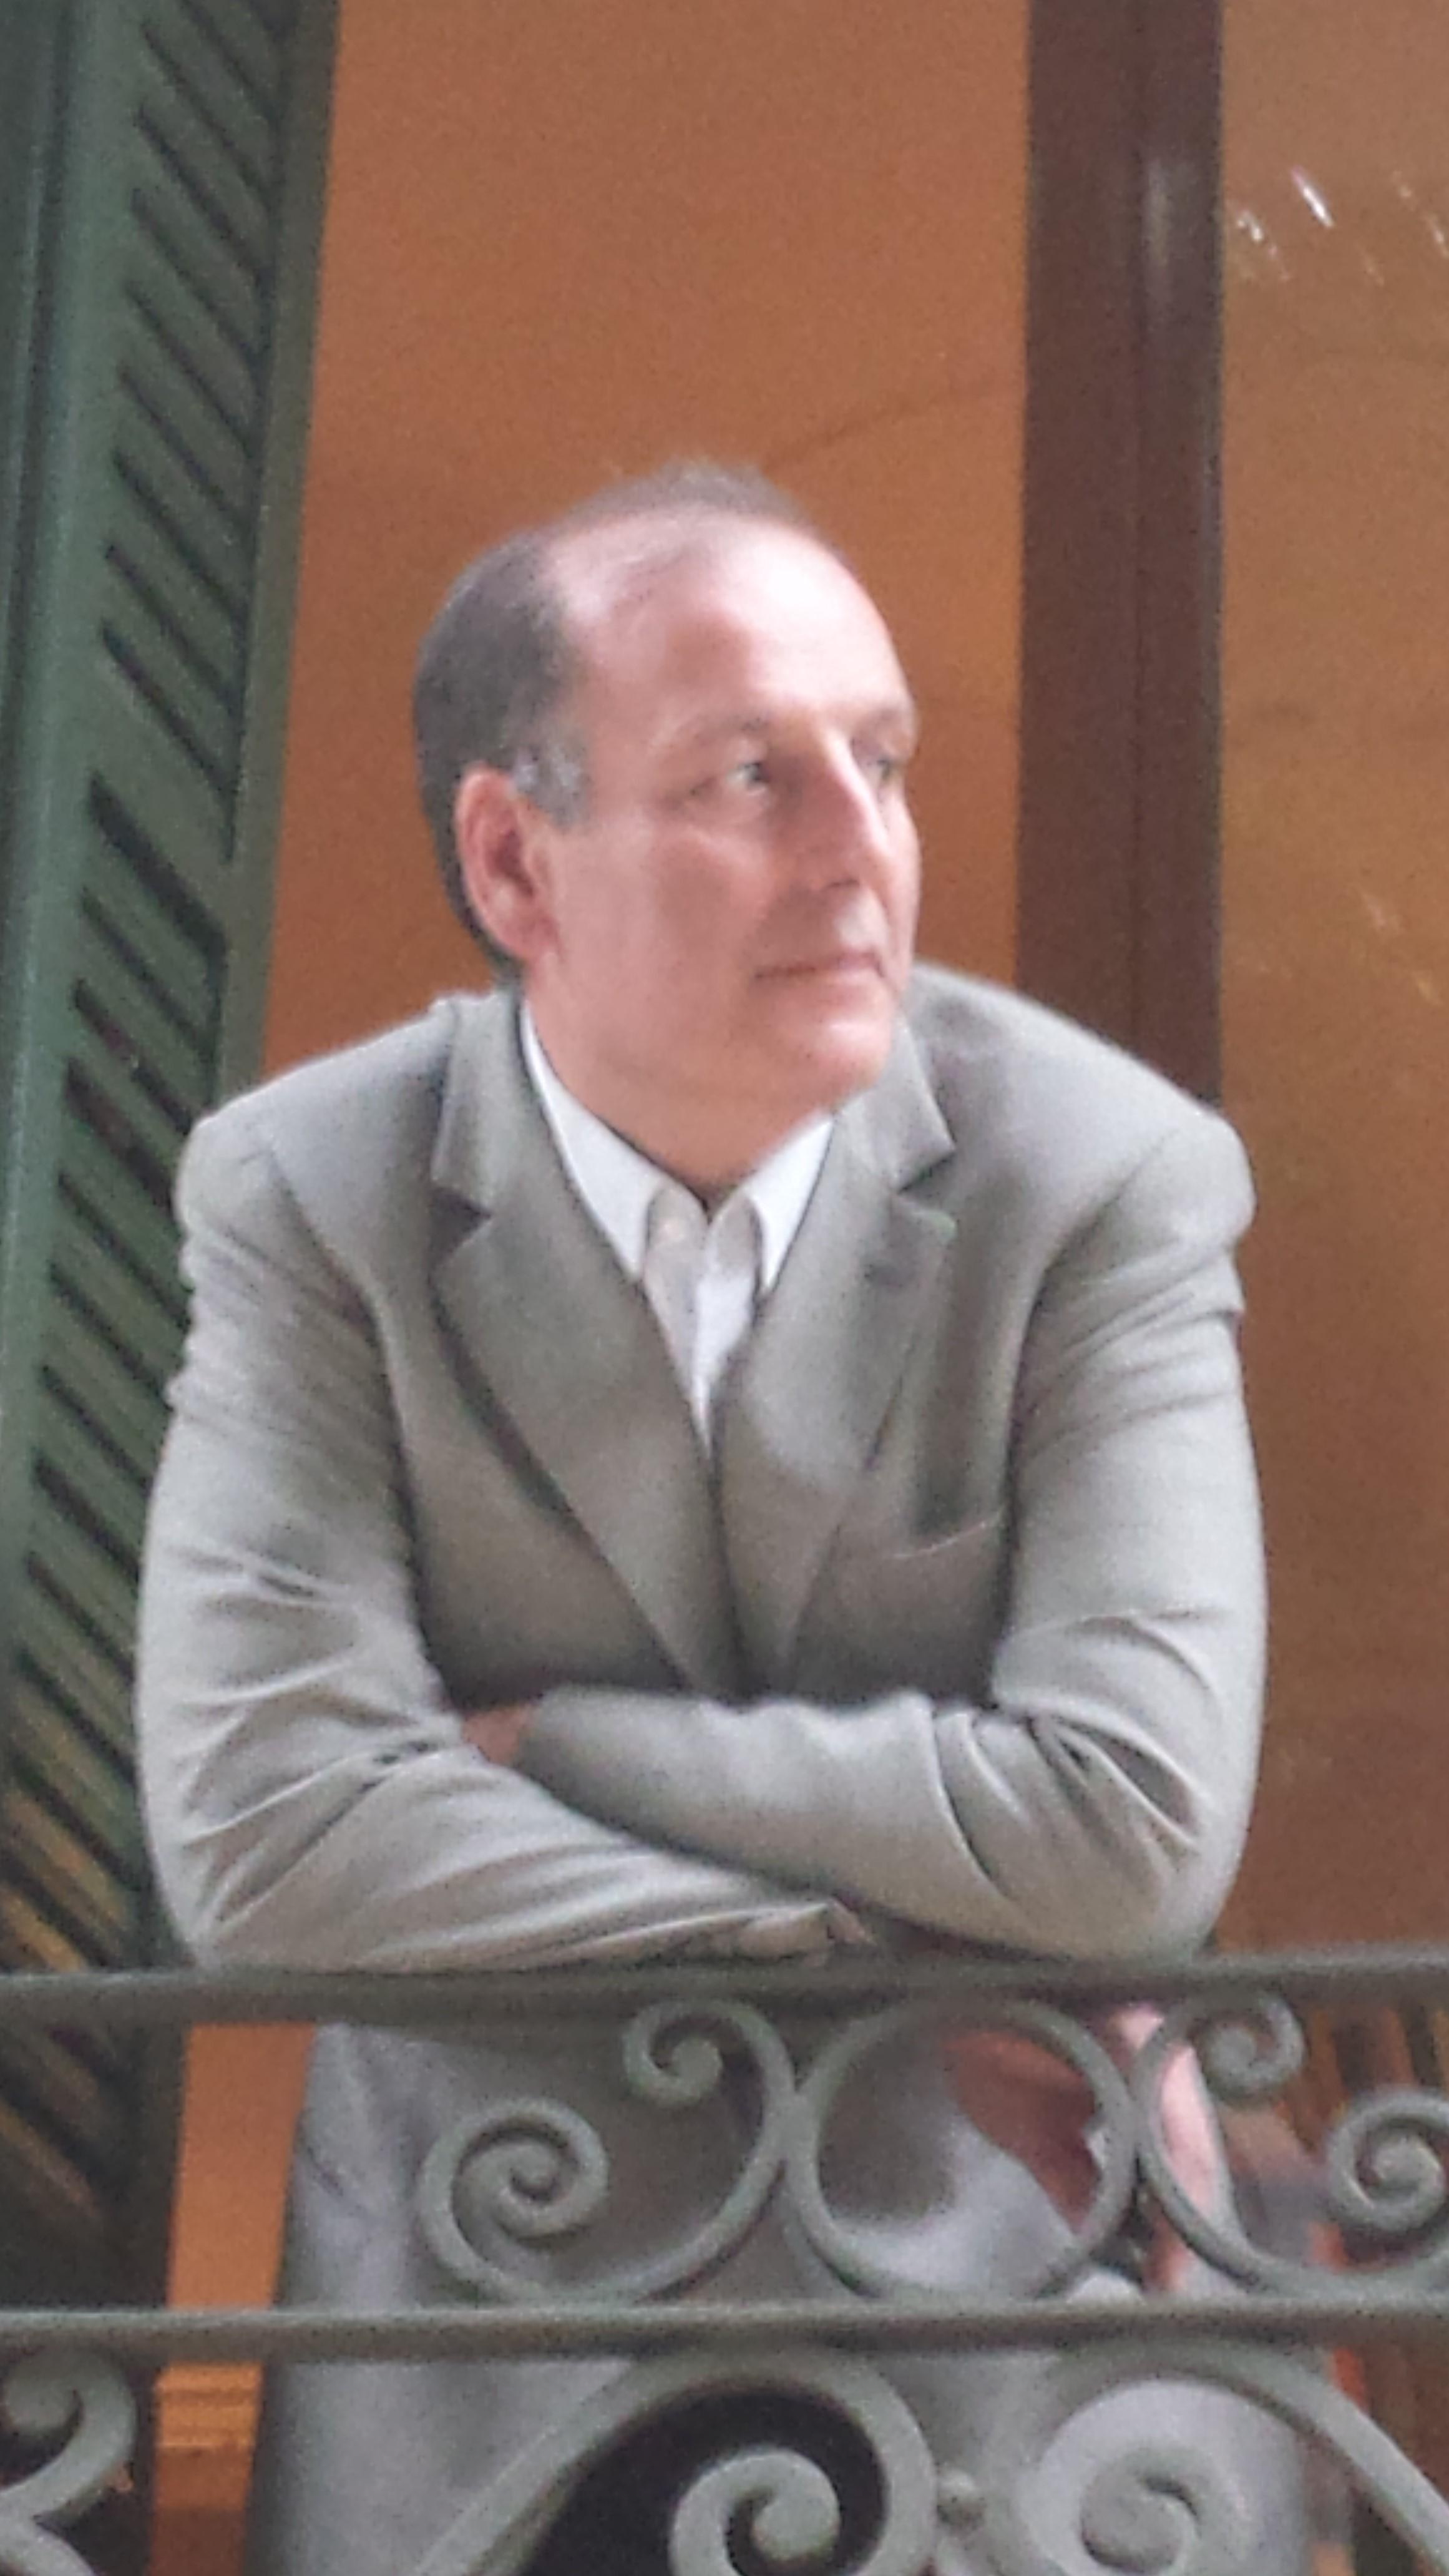 VÍCTOR MÉNDEZ BAIGES